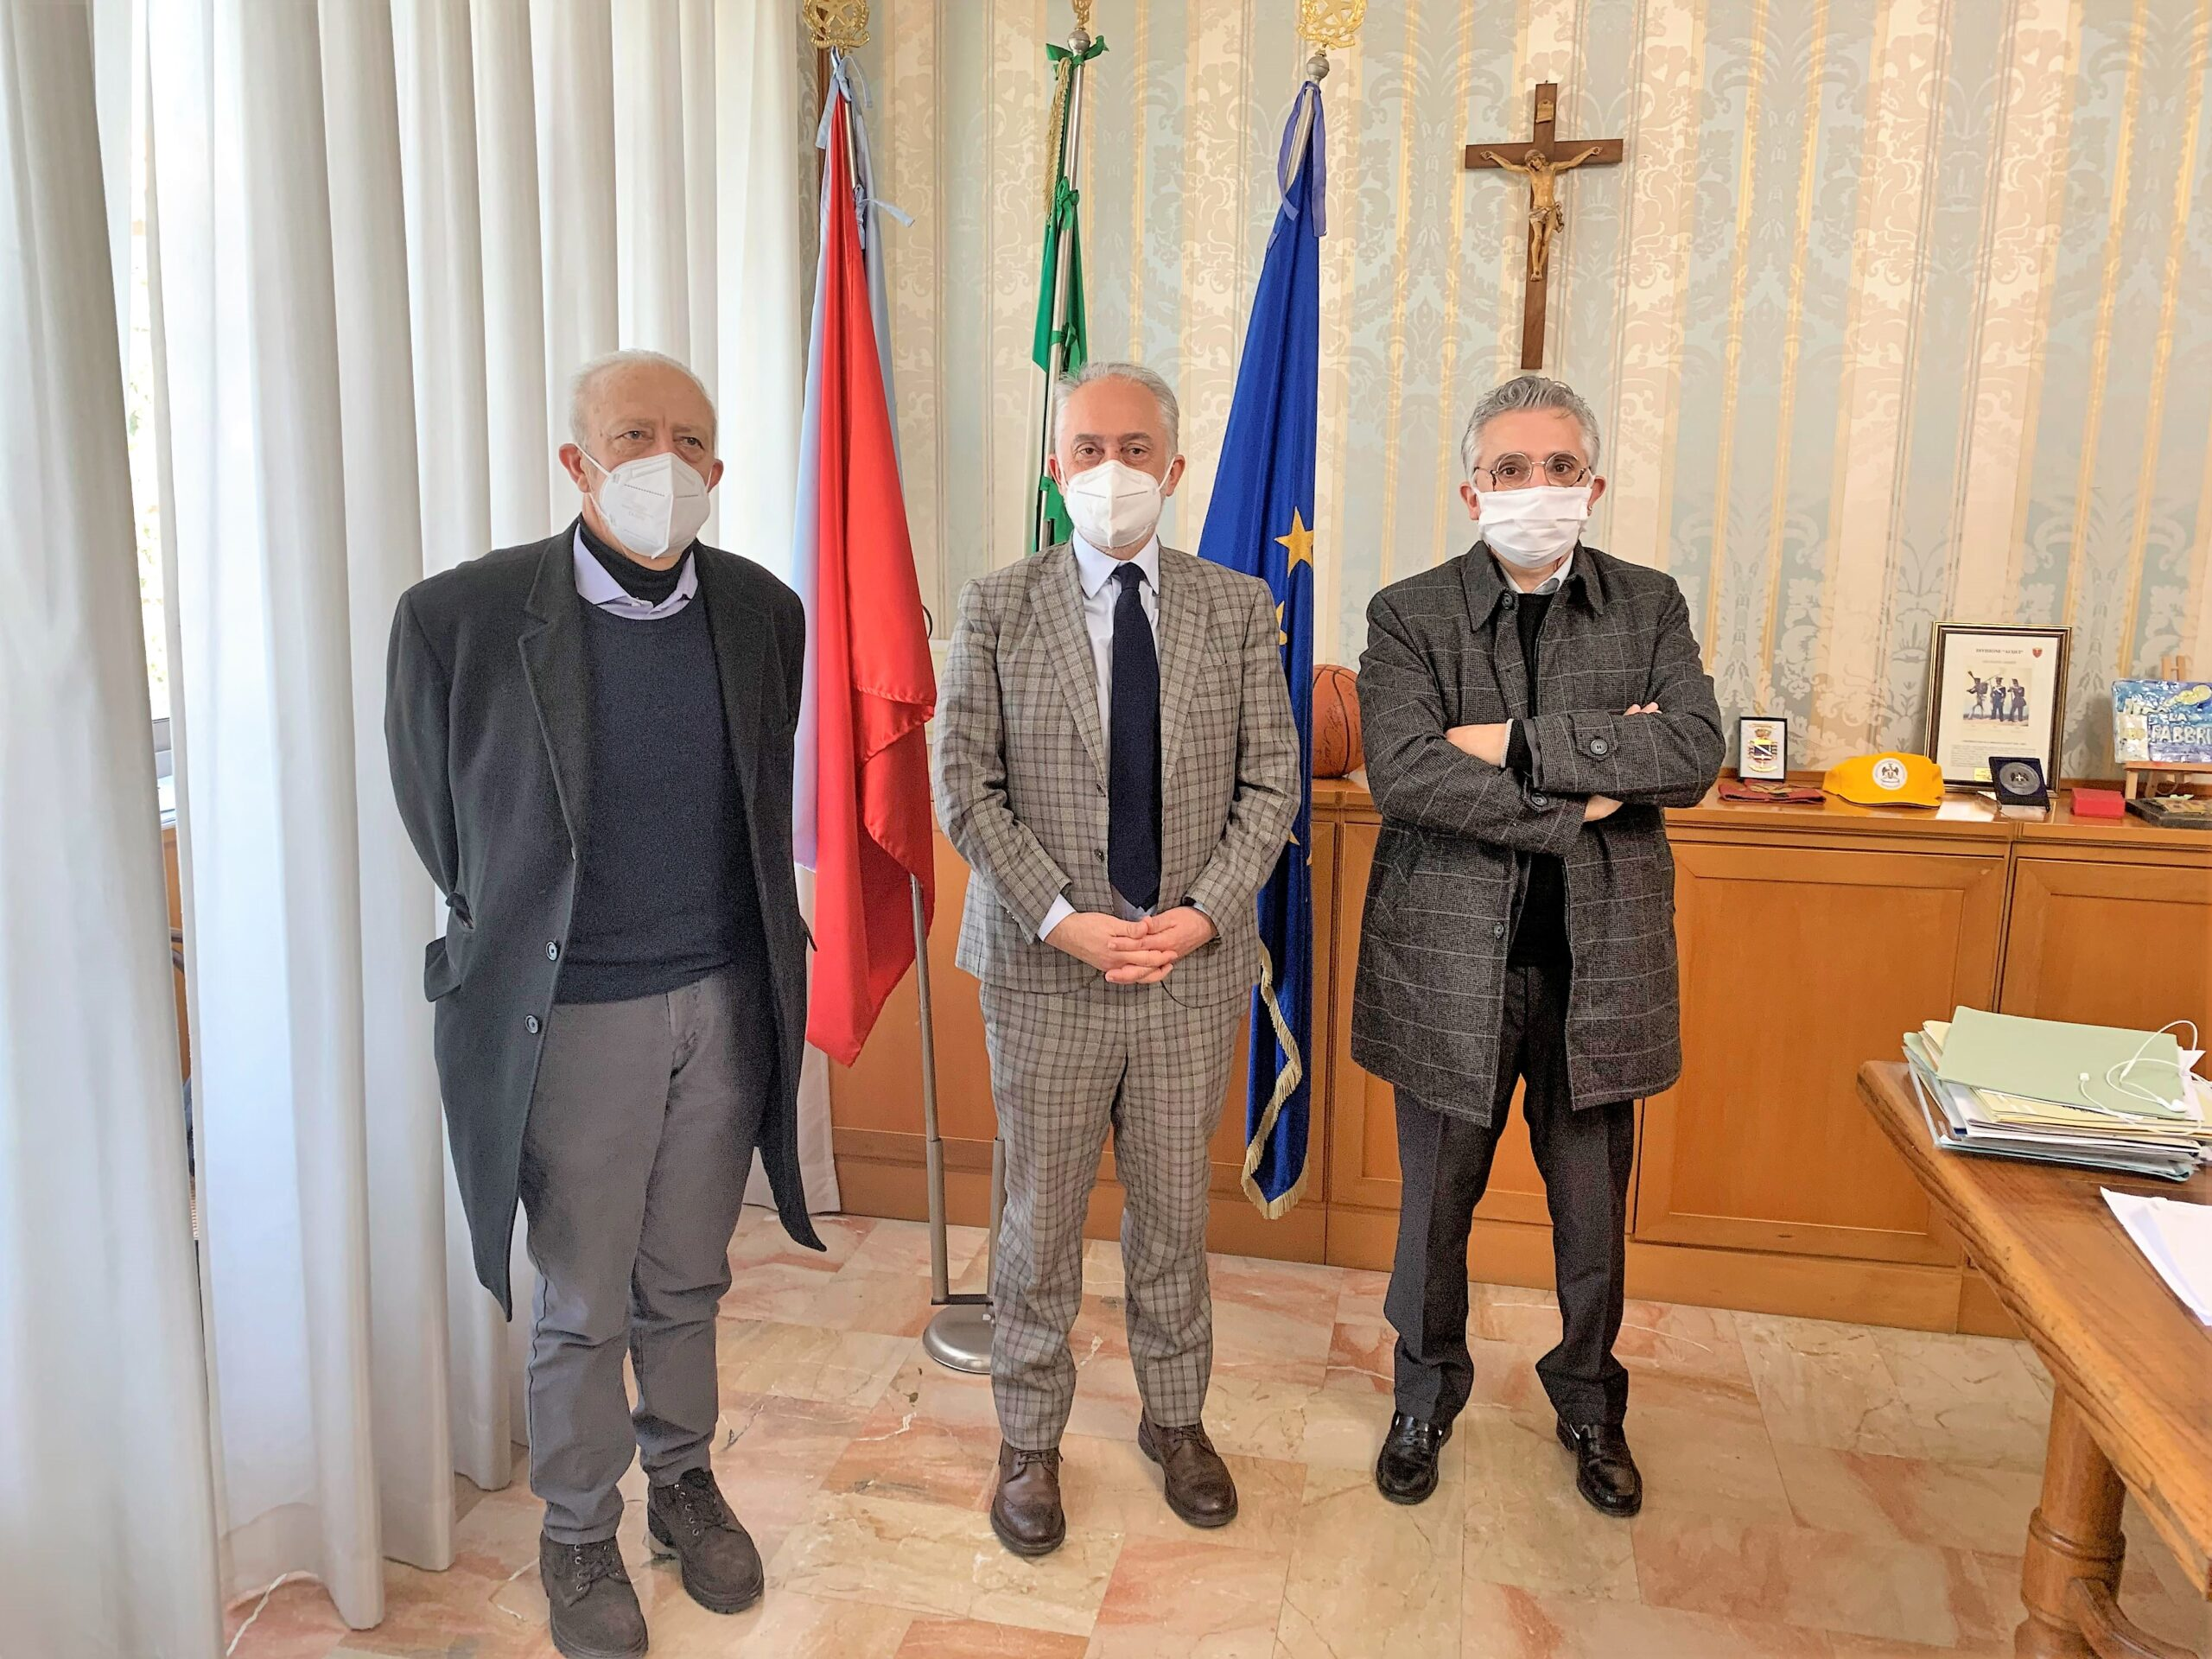 MarinoeUgl scaled CASERTA, LA UGL INCONTRA IL SINDACO MARINO